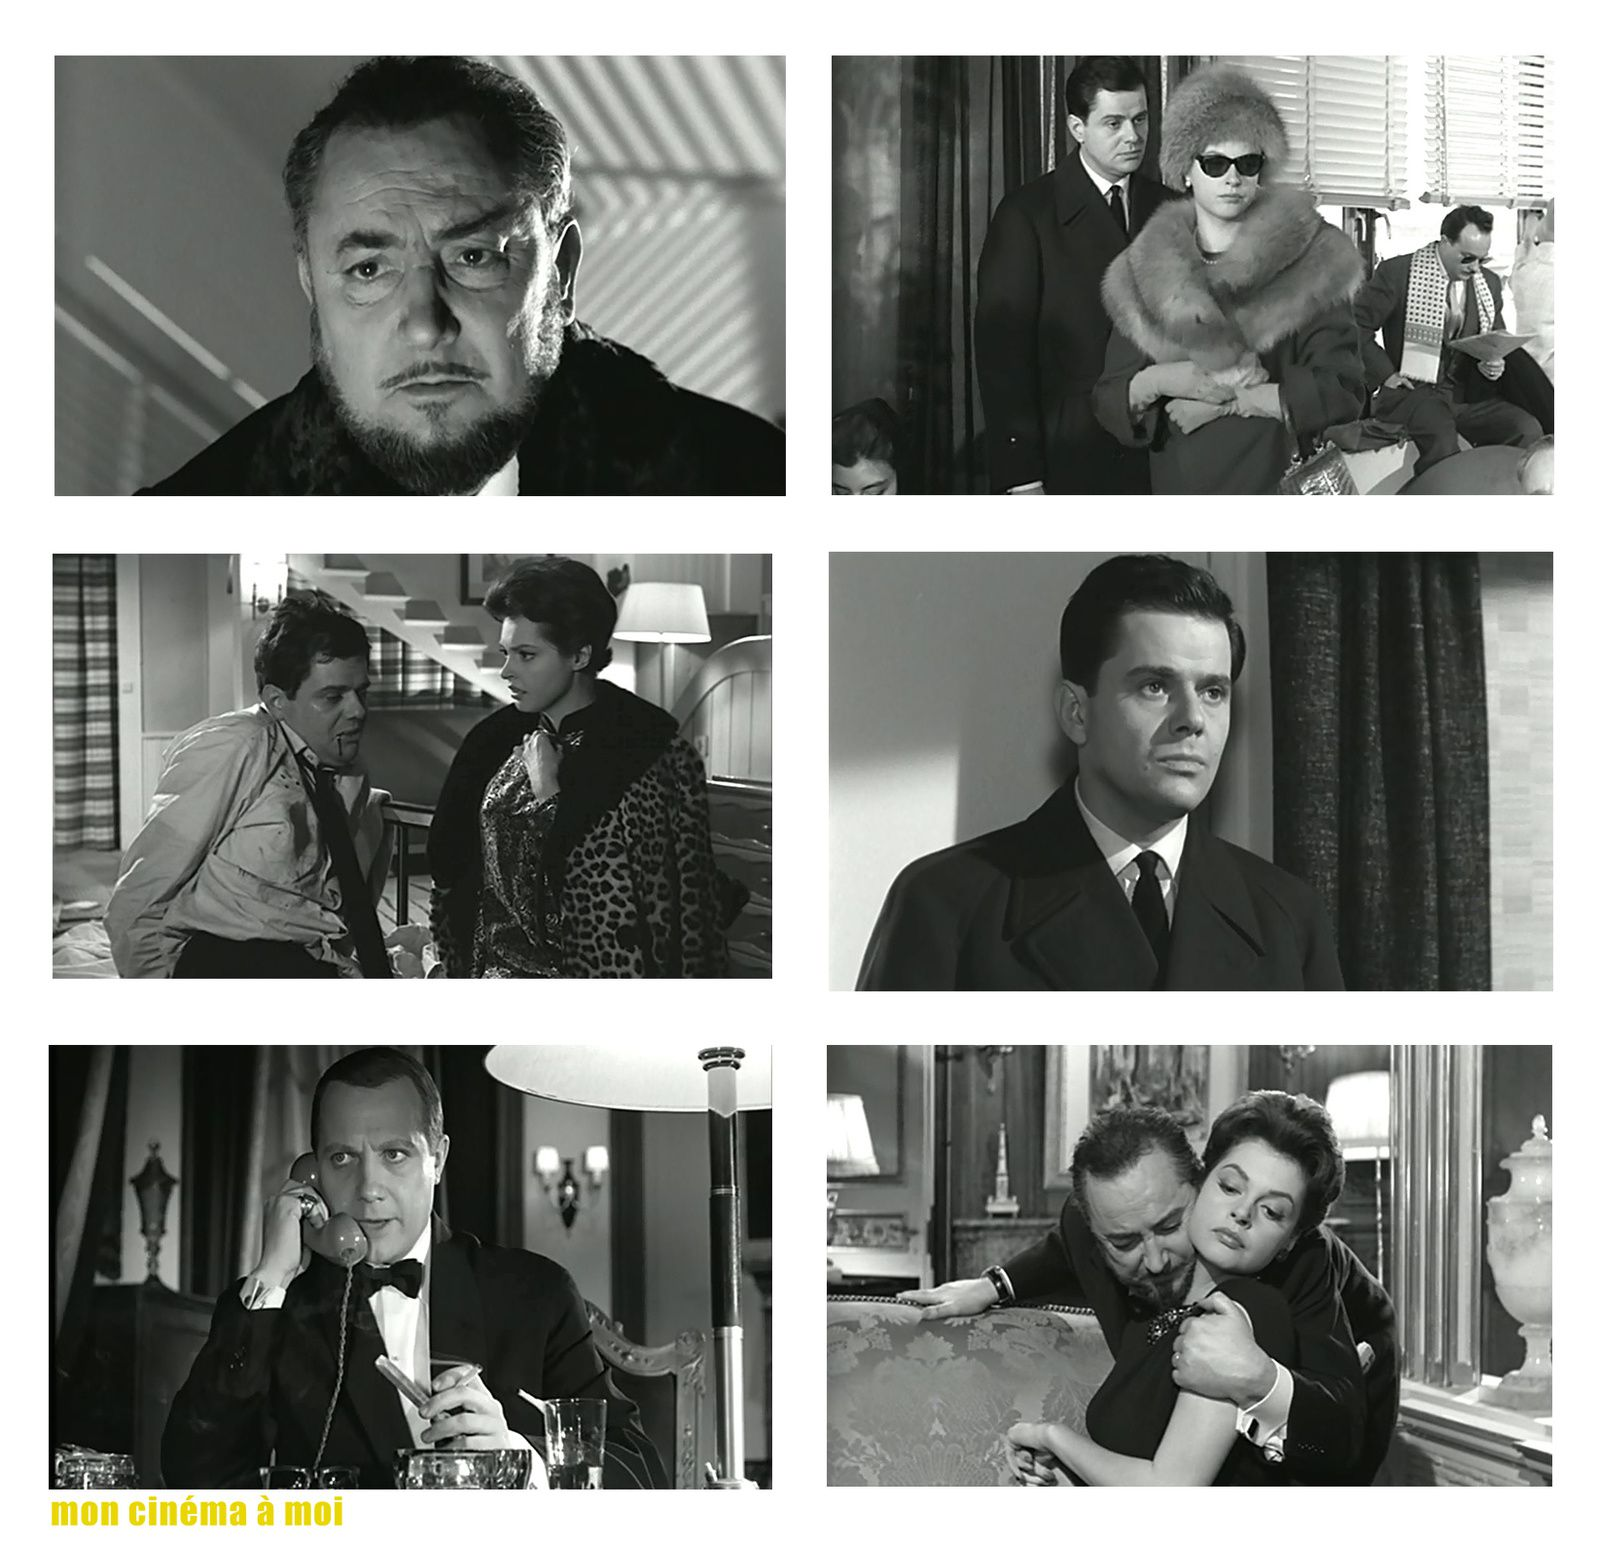 L'AFFAIRE NINA B de Robert Siodmak (1961)